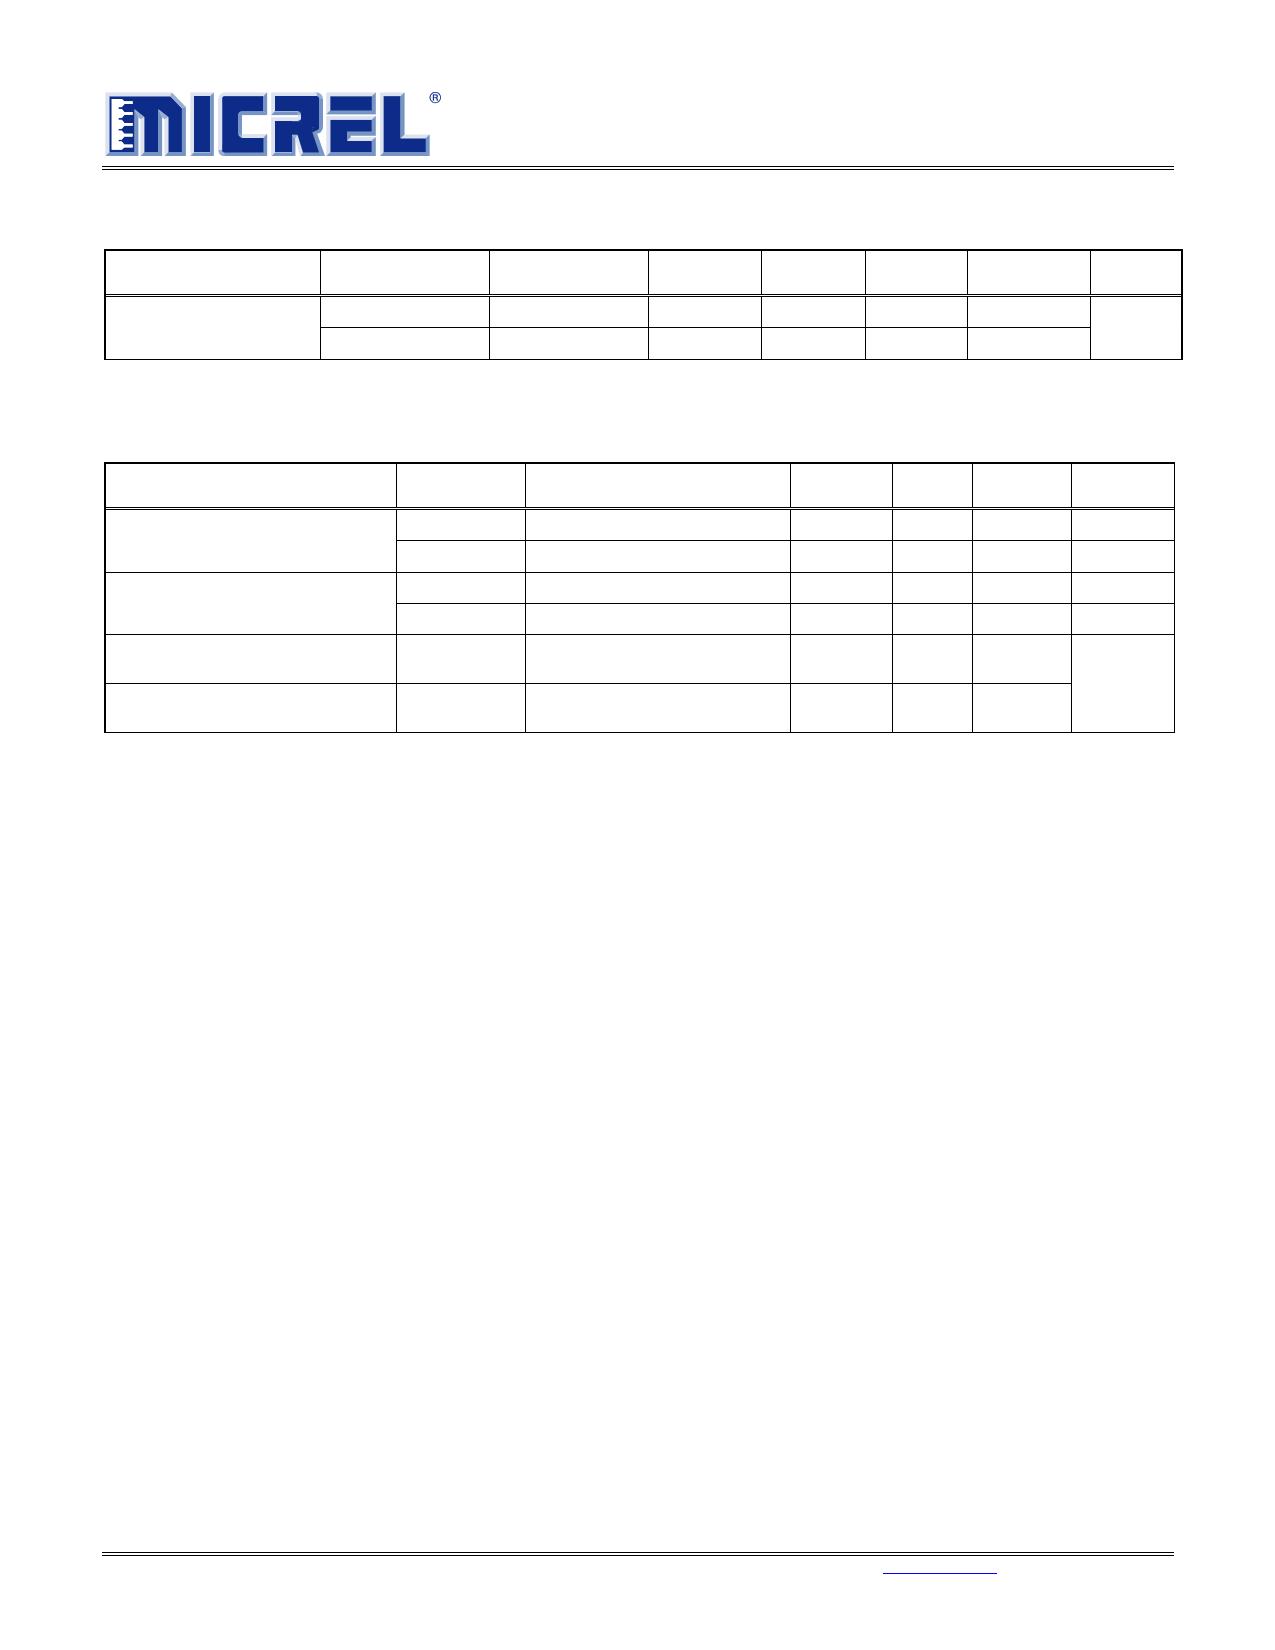 PL520-00 pdf, 반도체, 판매, 대치품